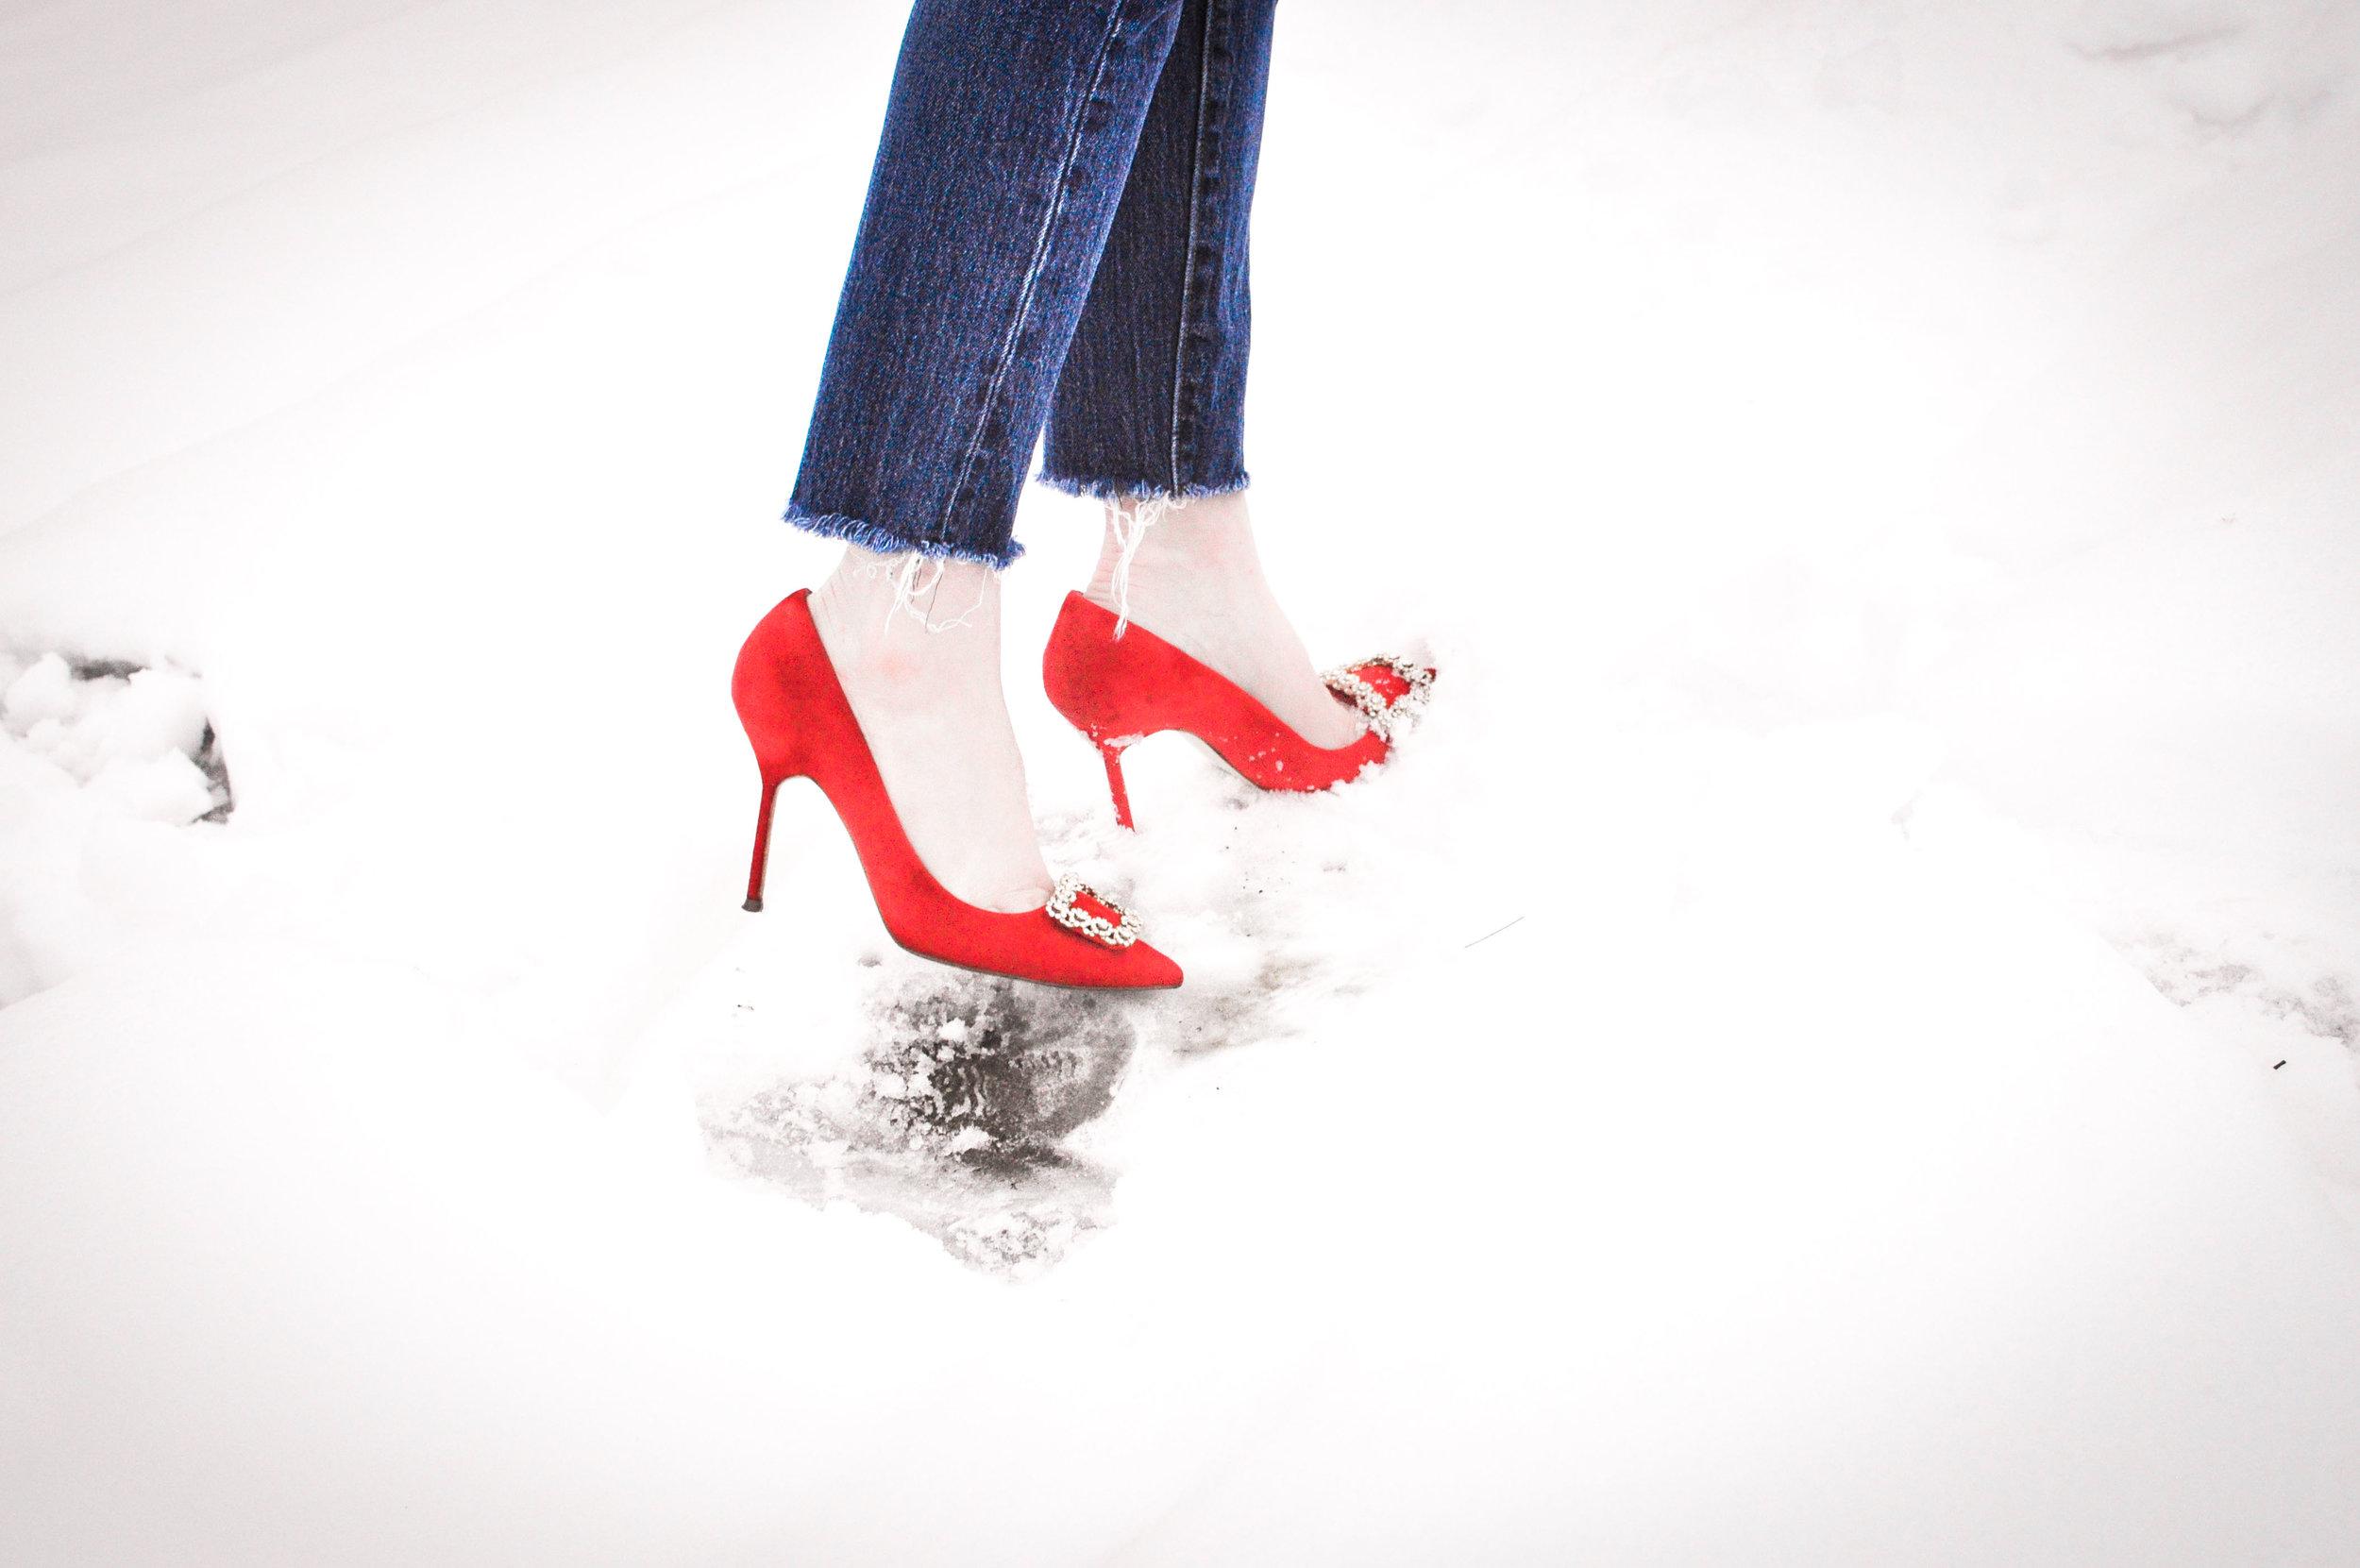 Red-Suede-Pumps-in-snow.jpg